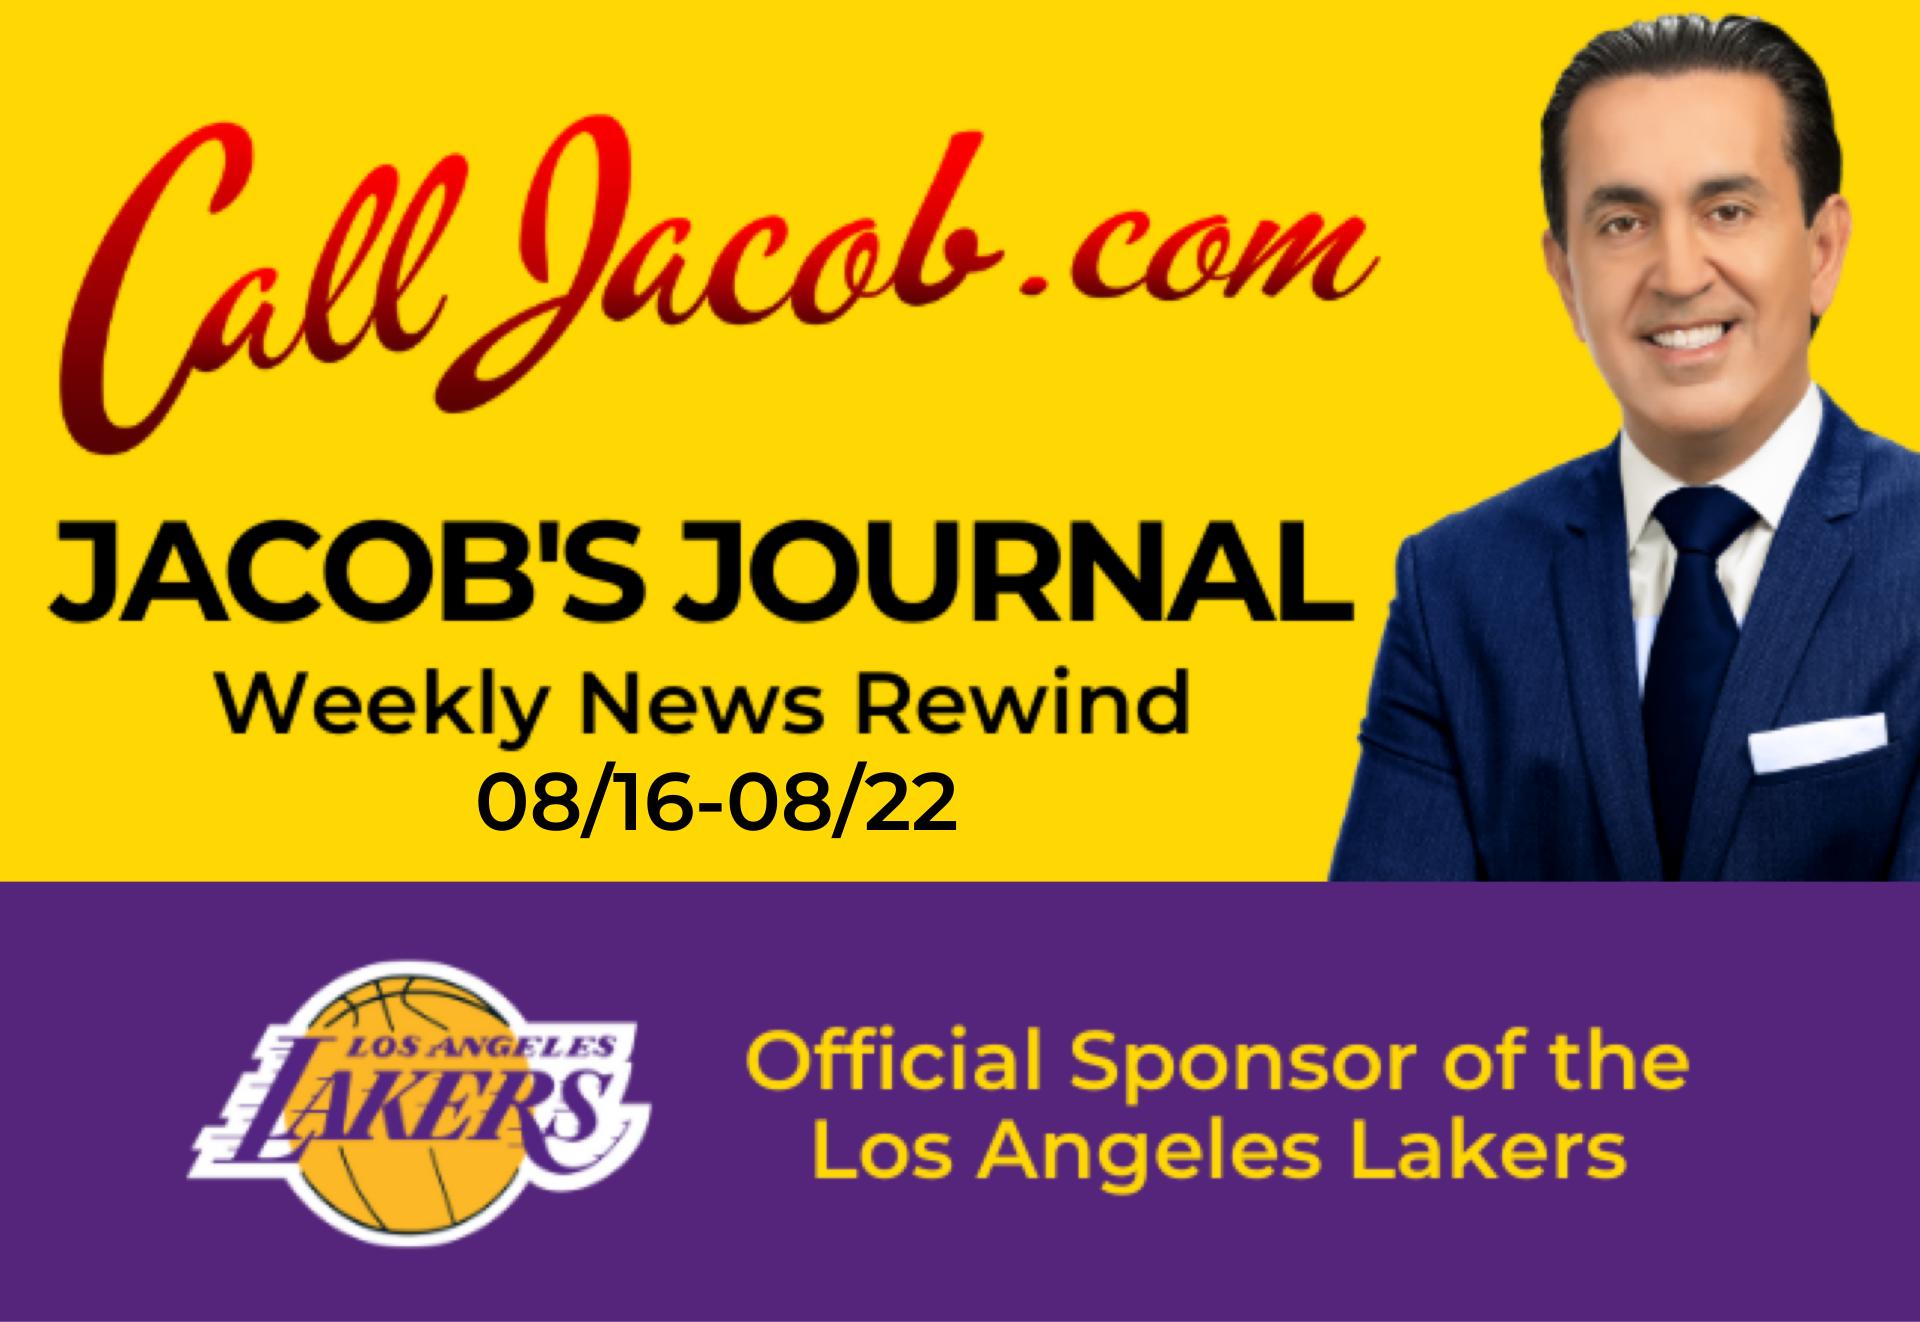 JacobsJournalWeeklyNewsRewind August 16th to August 22nd 2021